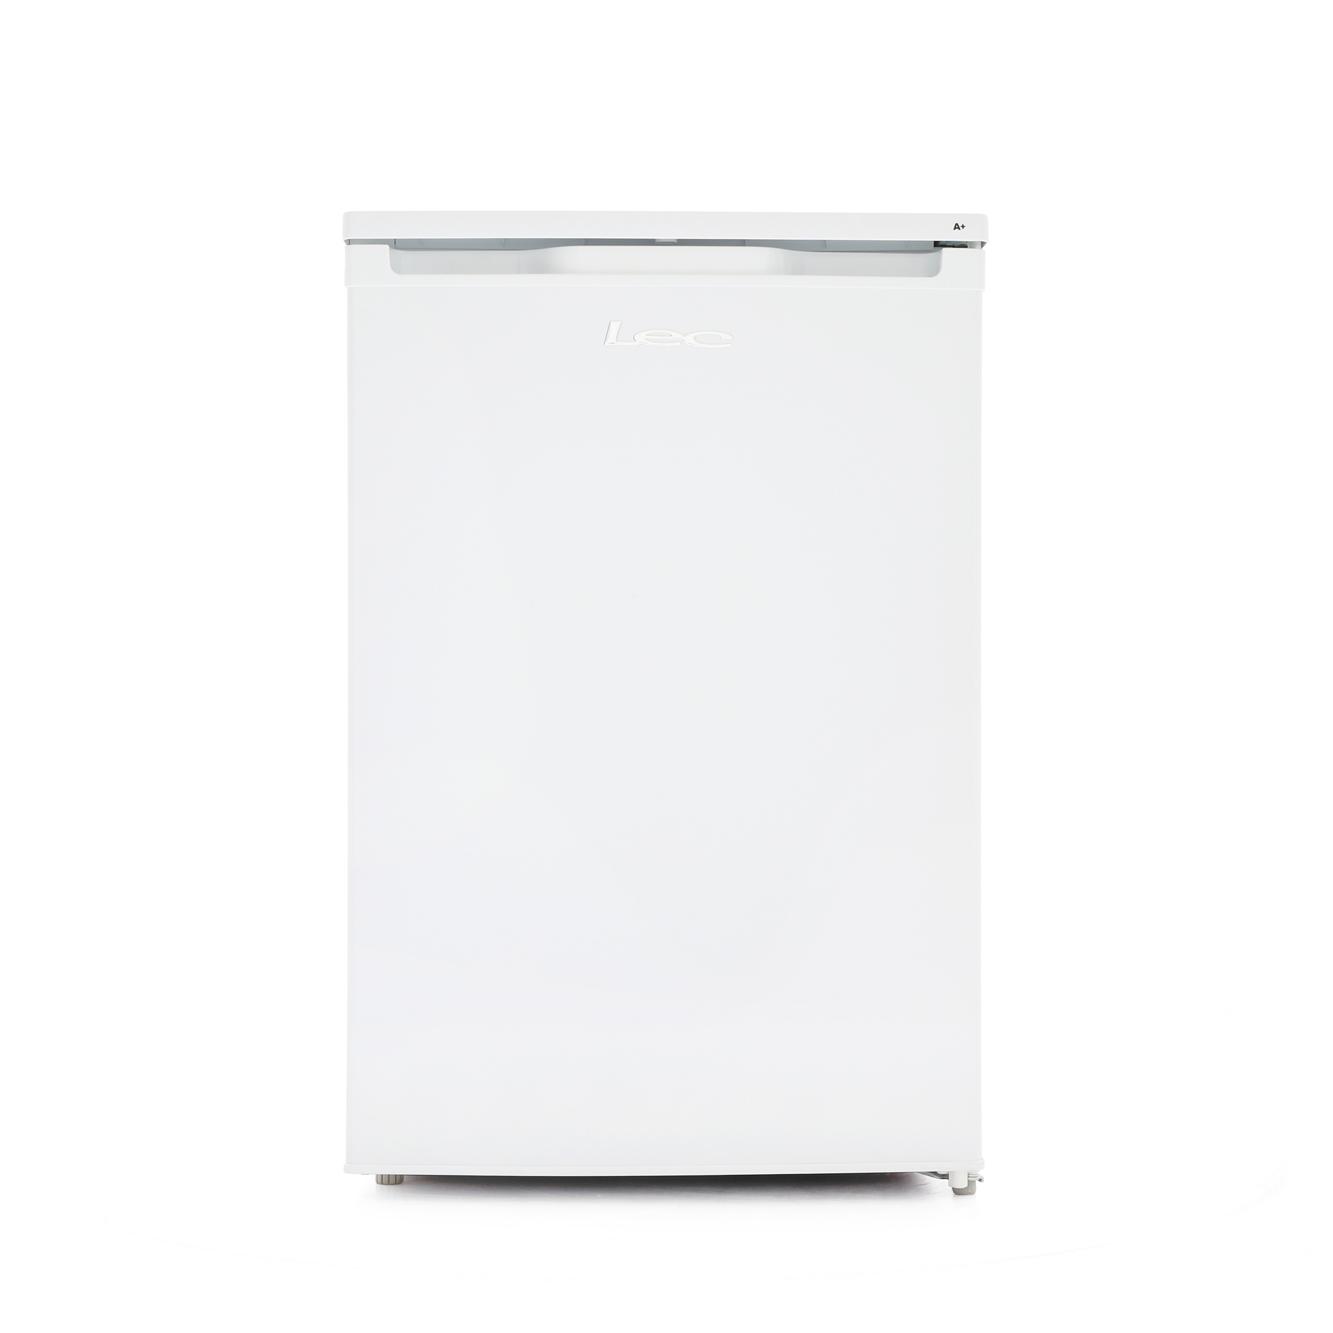 Buy Lec R W White Fridge With Ice Box